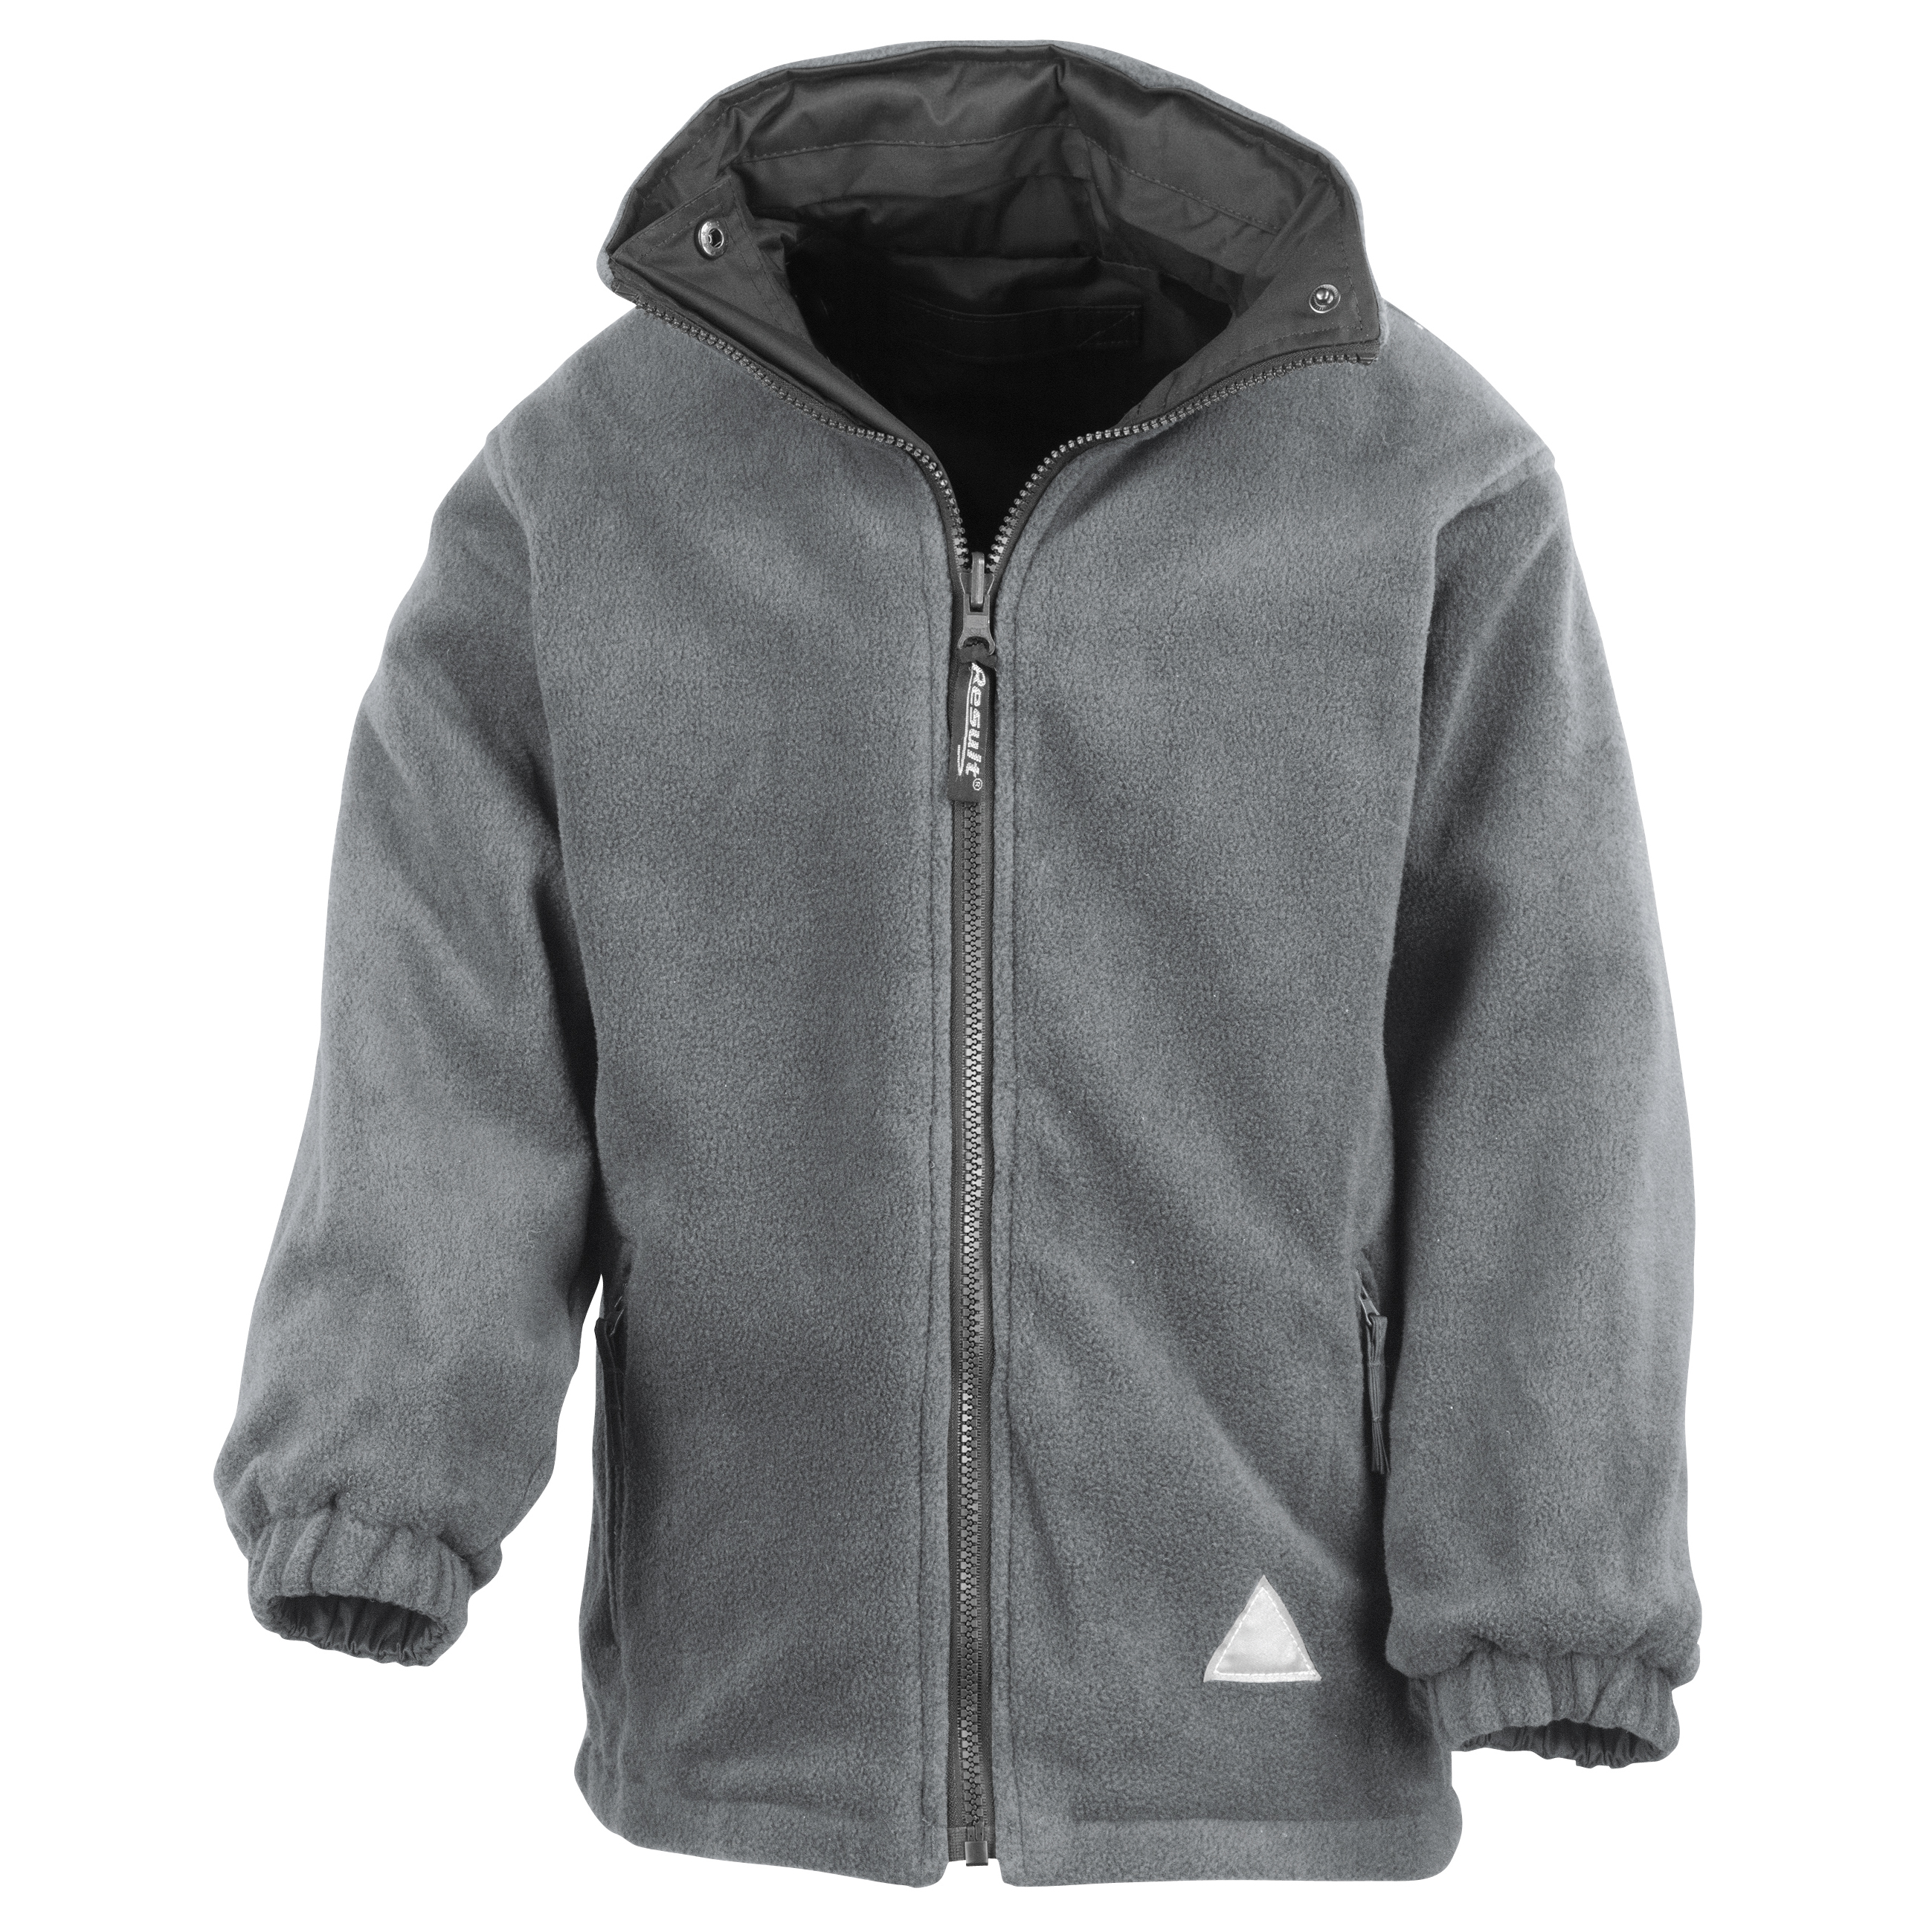 Result Childrens/Kids Reversible Storm Stuff Anti Pilling Fleece Waterproof Jacket (3/4) (Black/Grey)